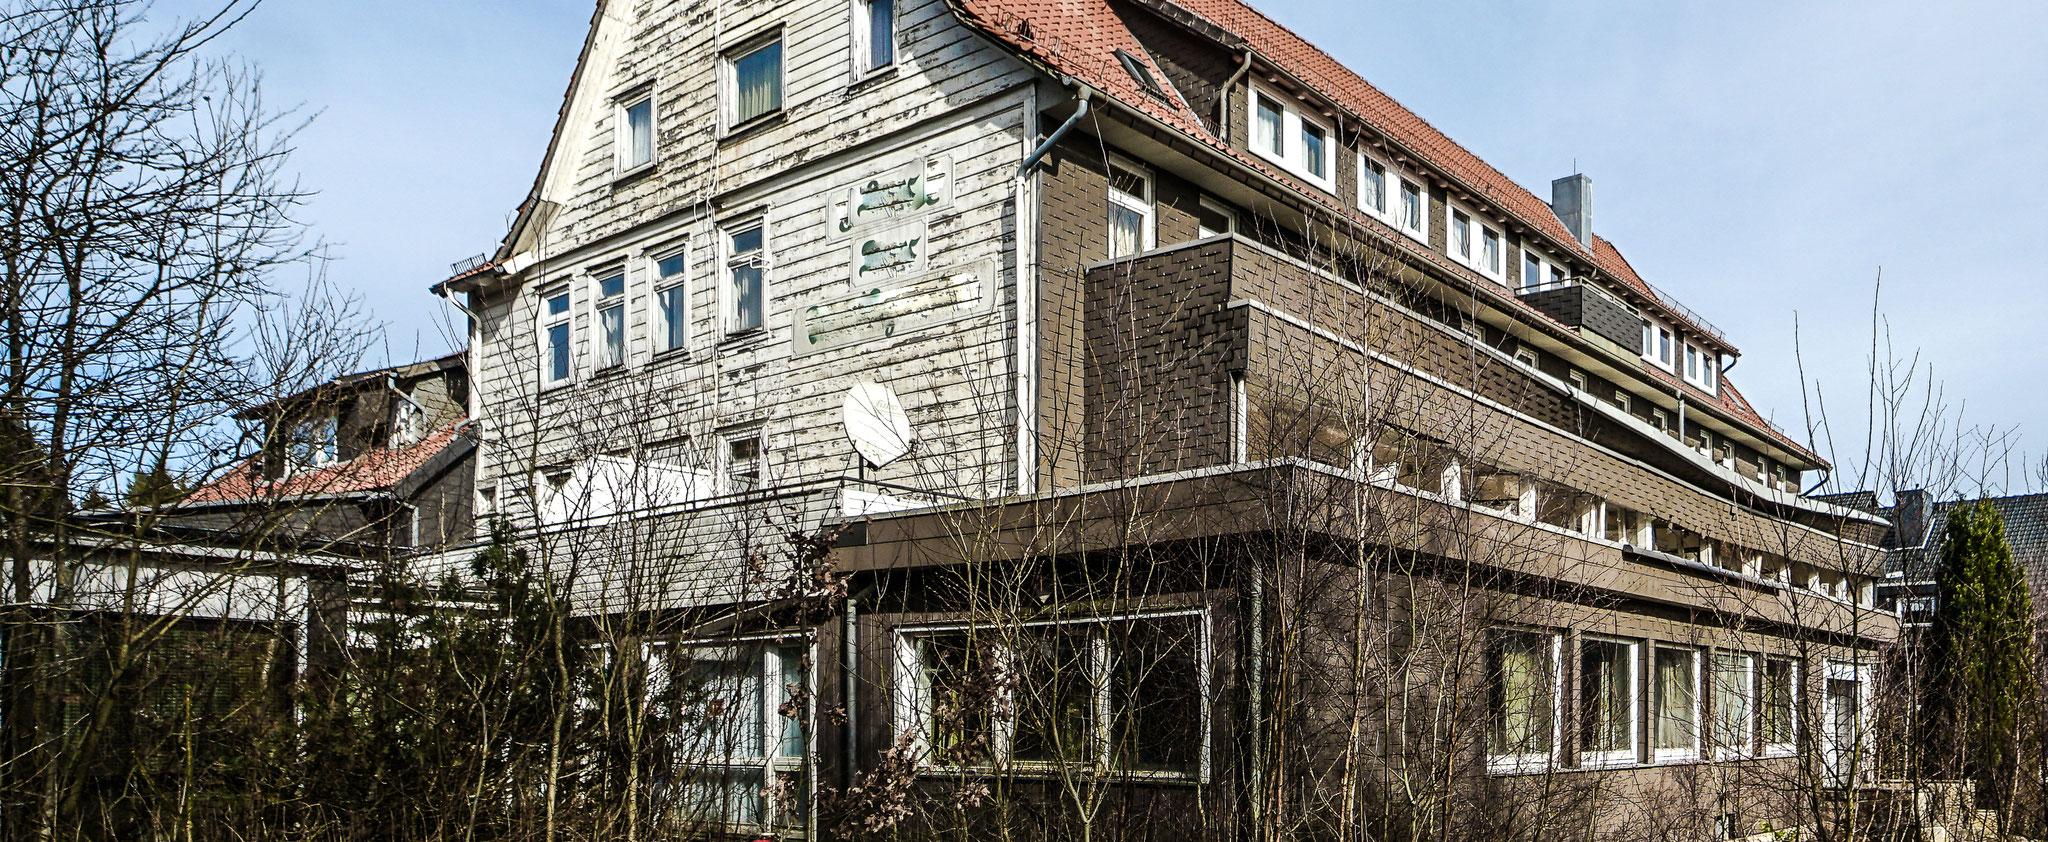 Das ehemalige Hotel